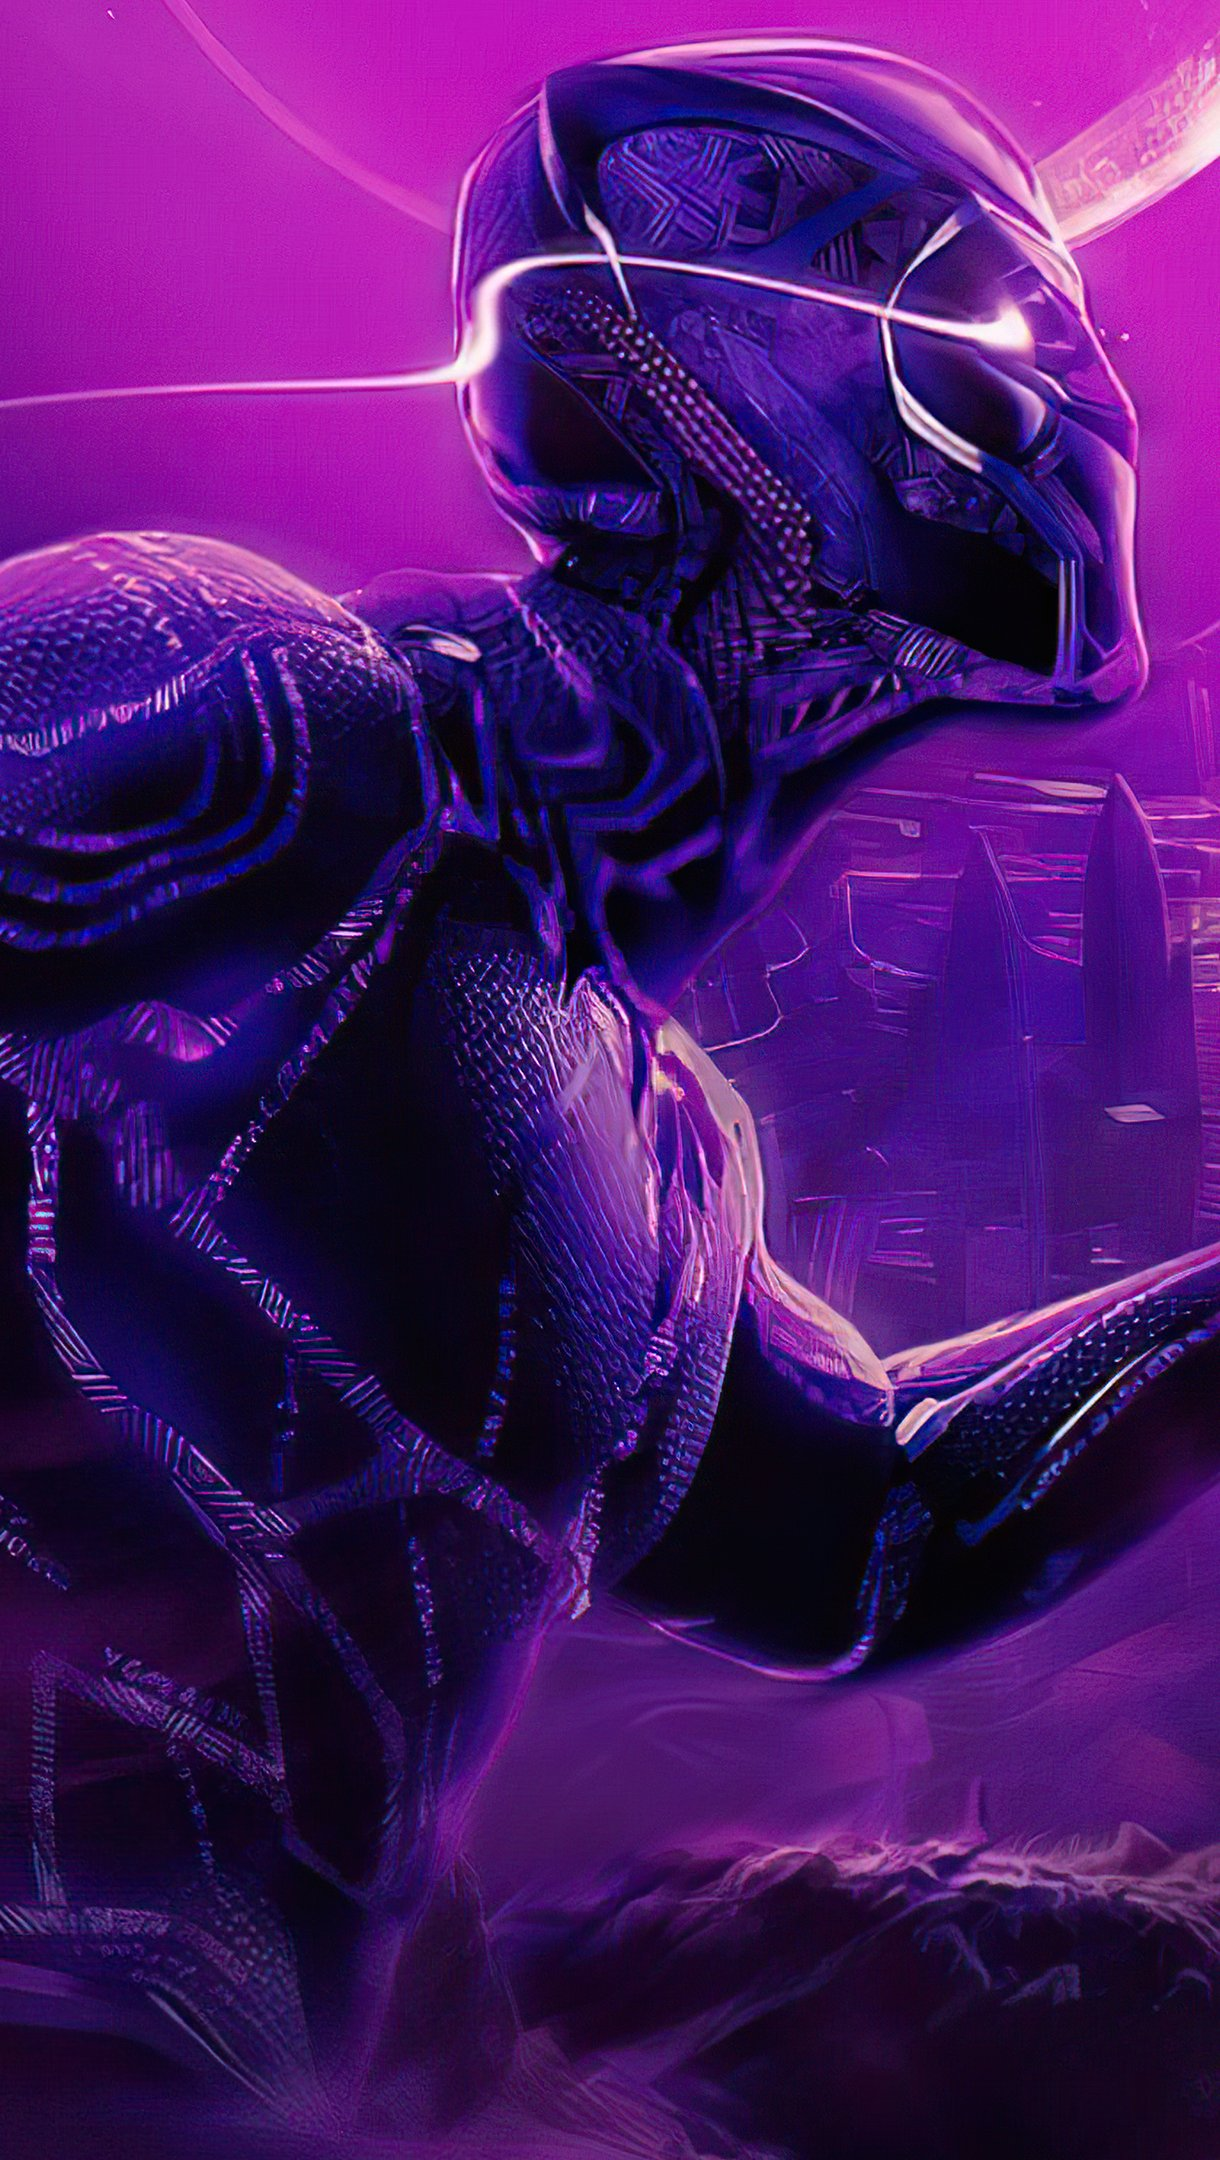 Wallpaper Black Panther Vertical